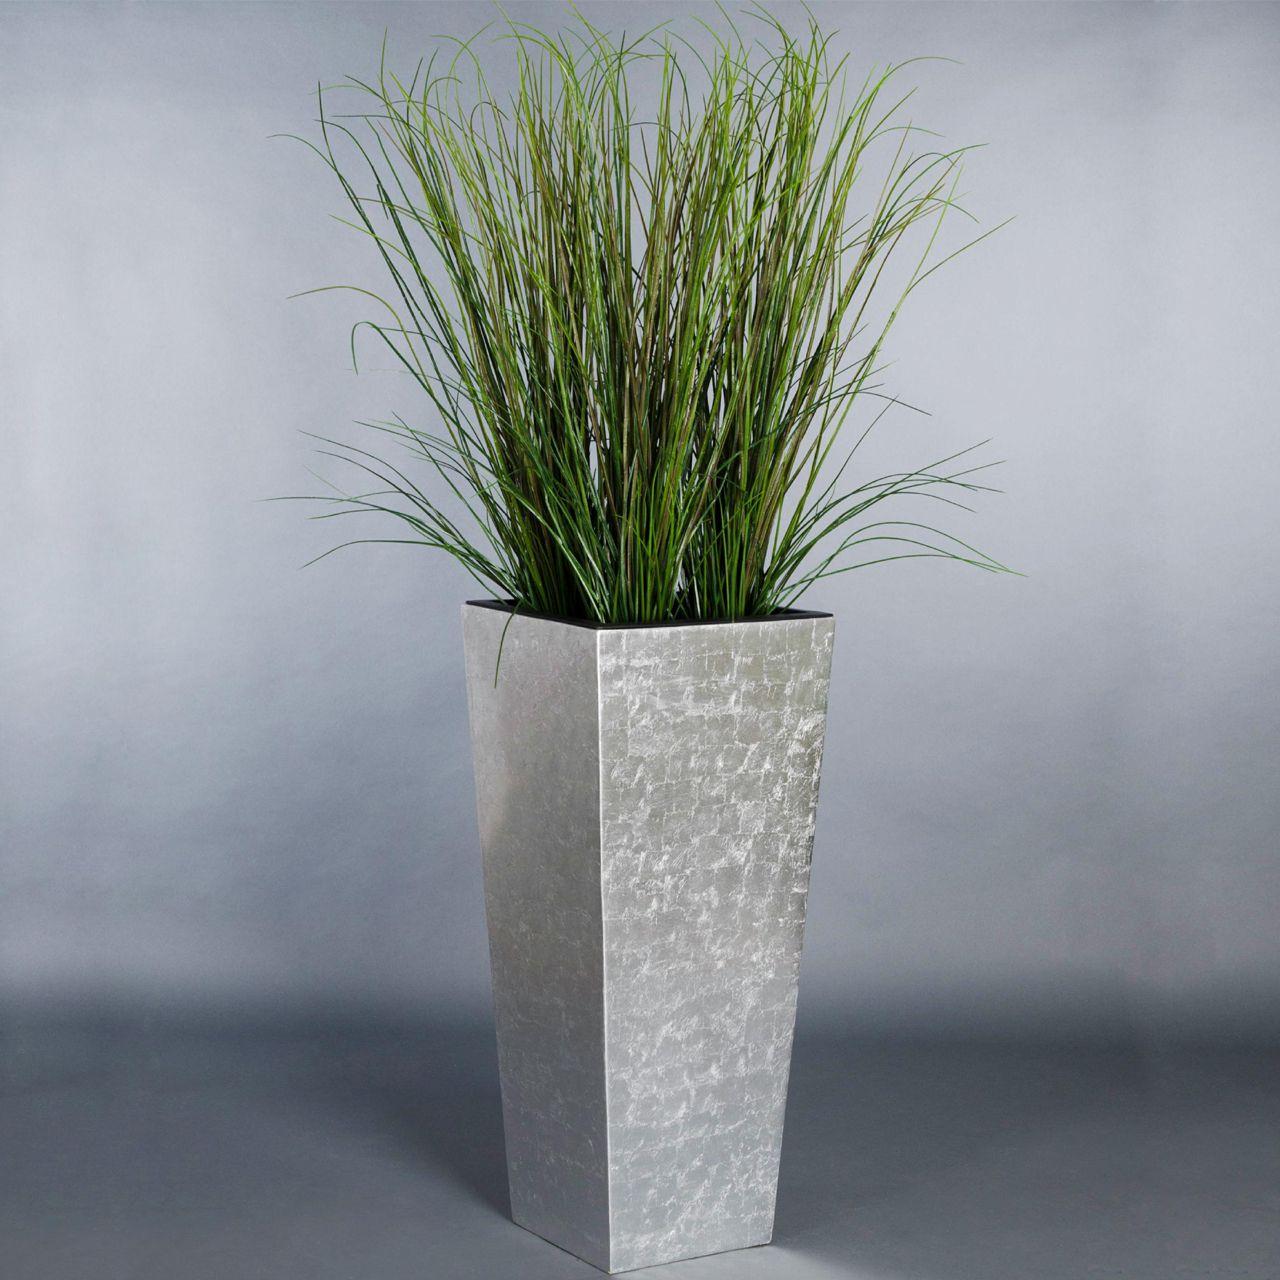 pflanzgef classic aus fiberglas. Black Bedroom Furniture Sets. Home Design Ideas